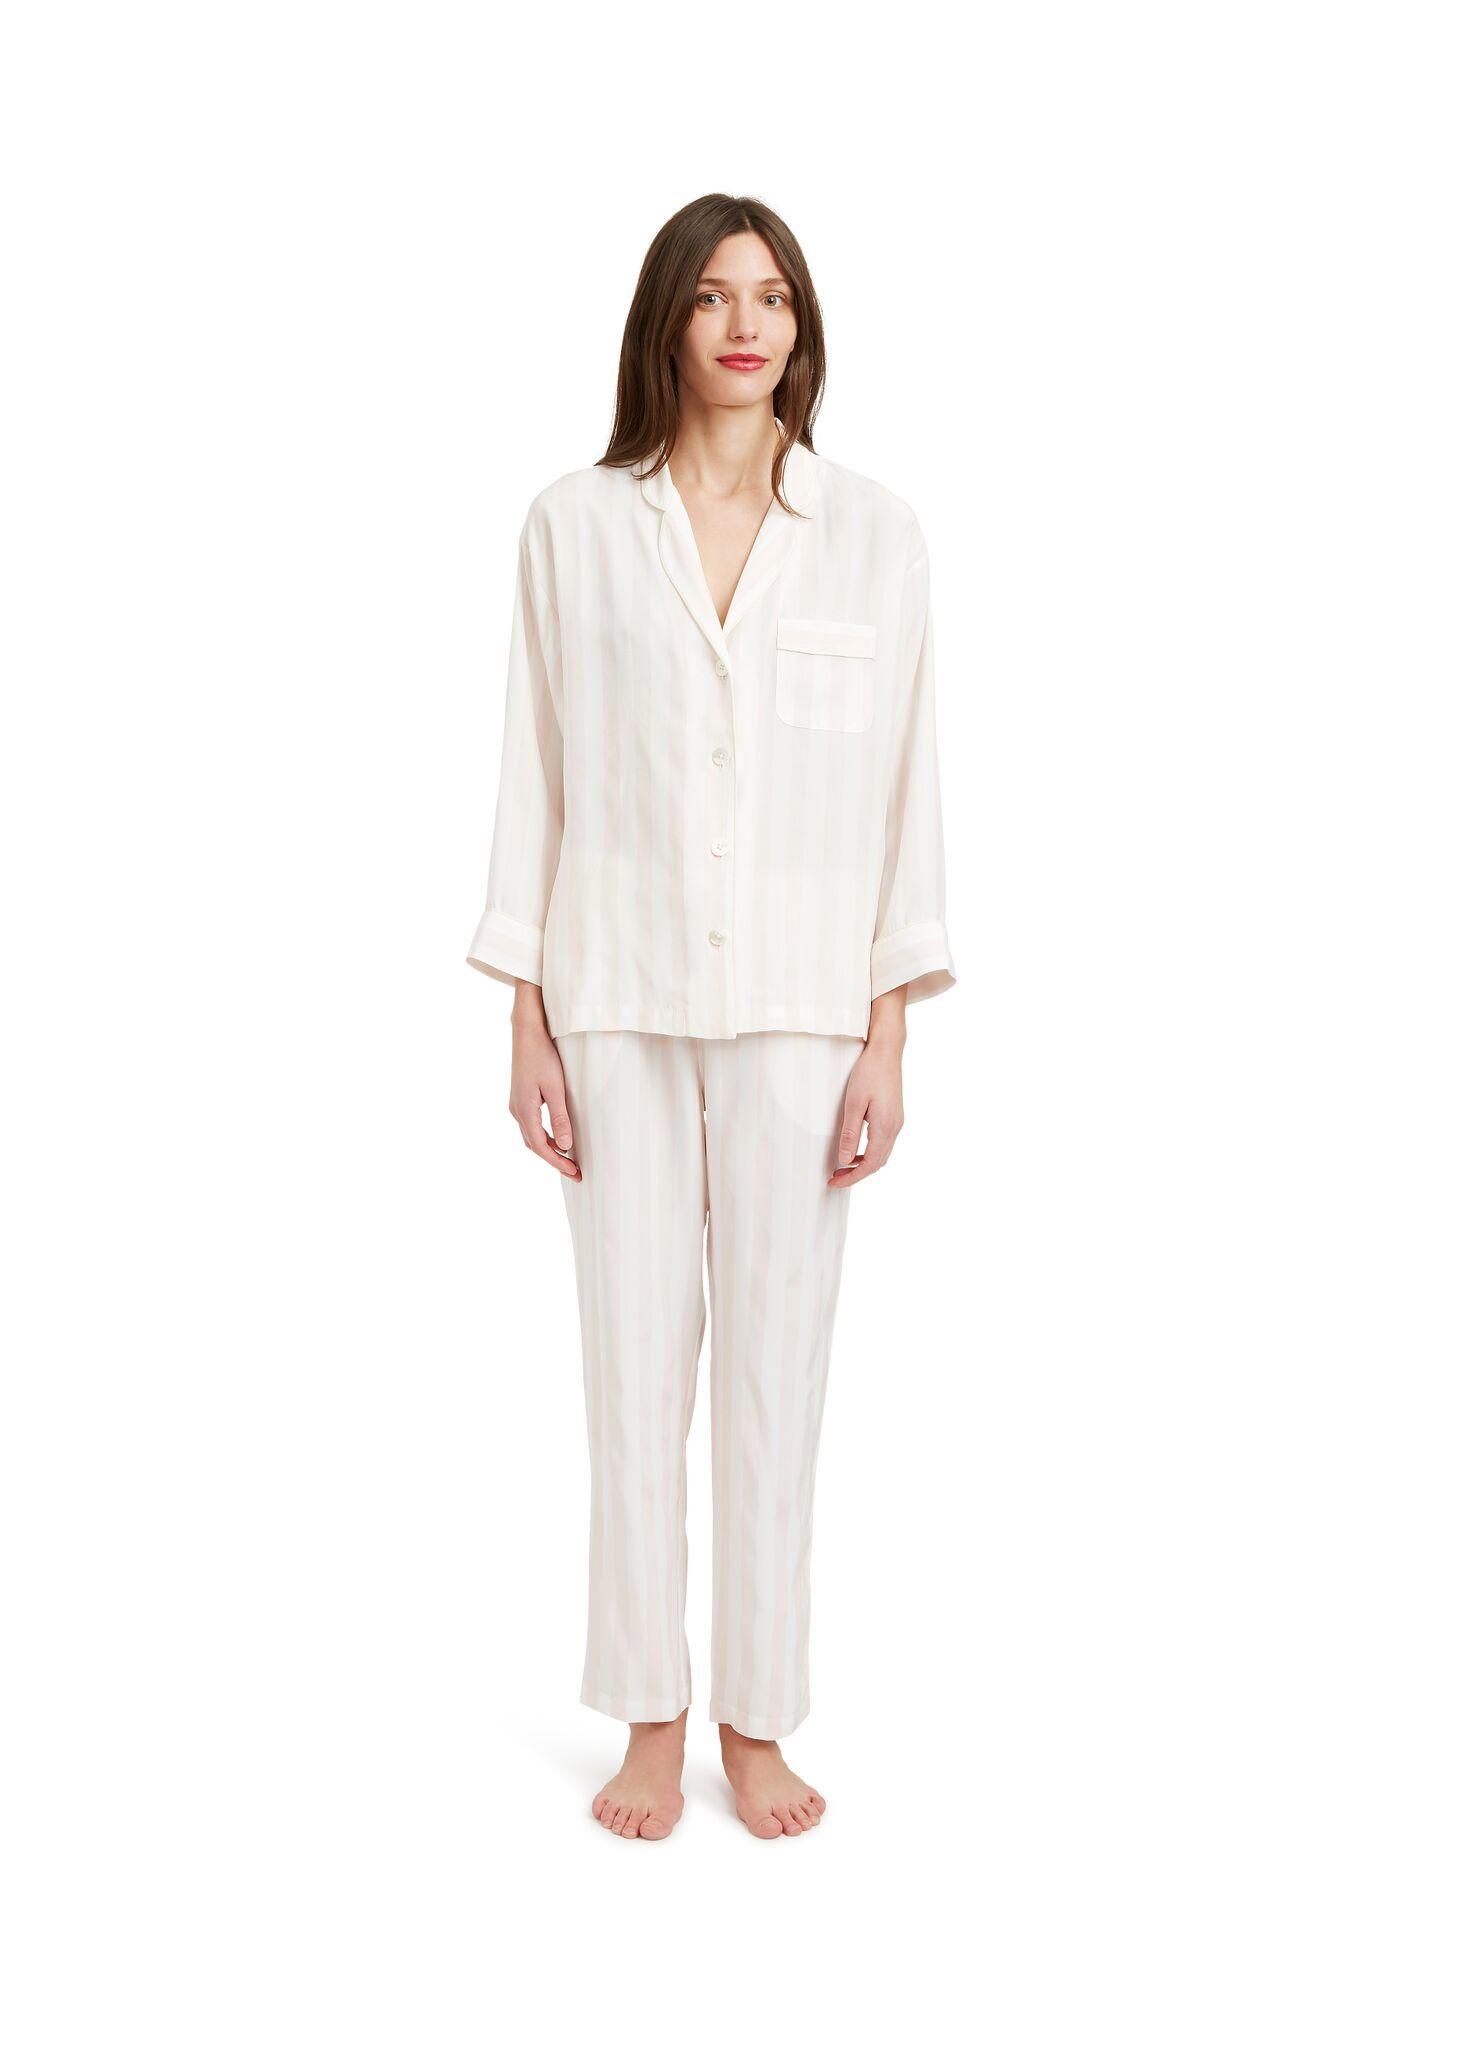 #sleepyjones #underwear #pajamas #sleepy #lounge #summer #fashion #newyork #santamonica